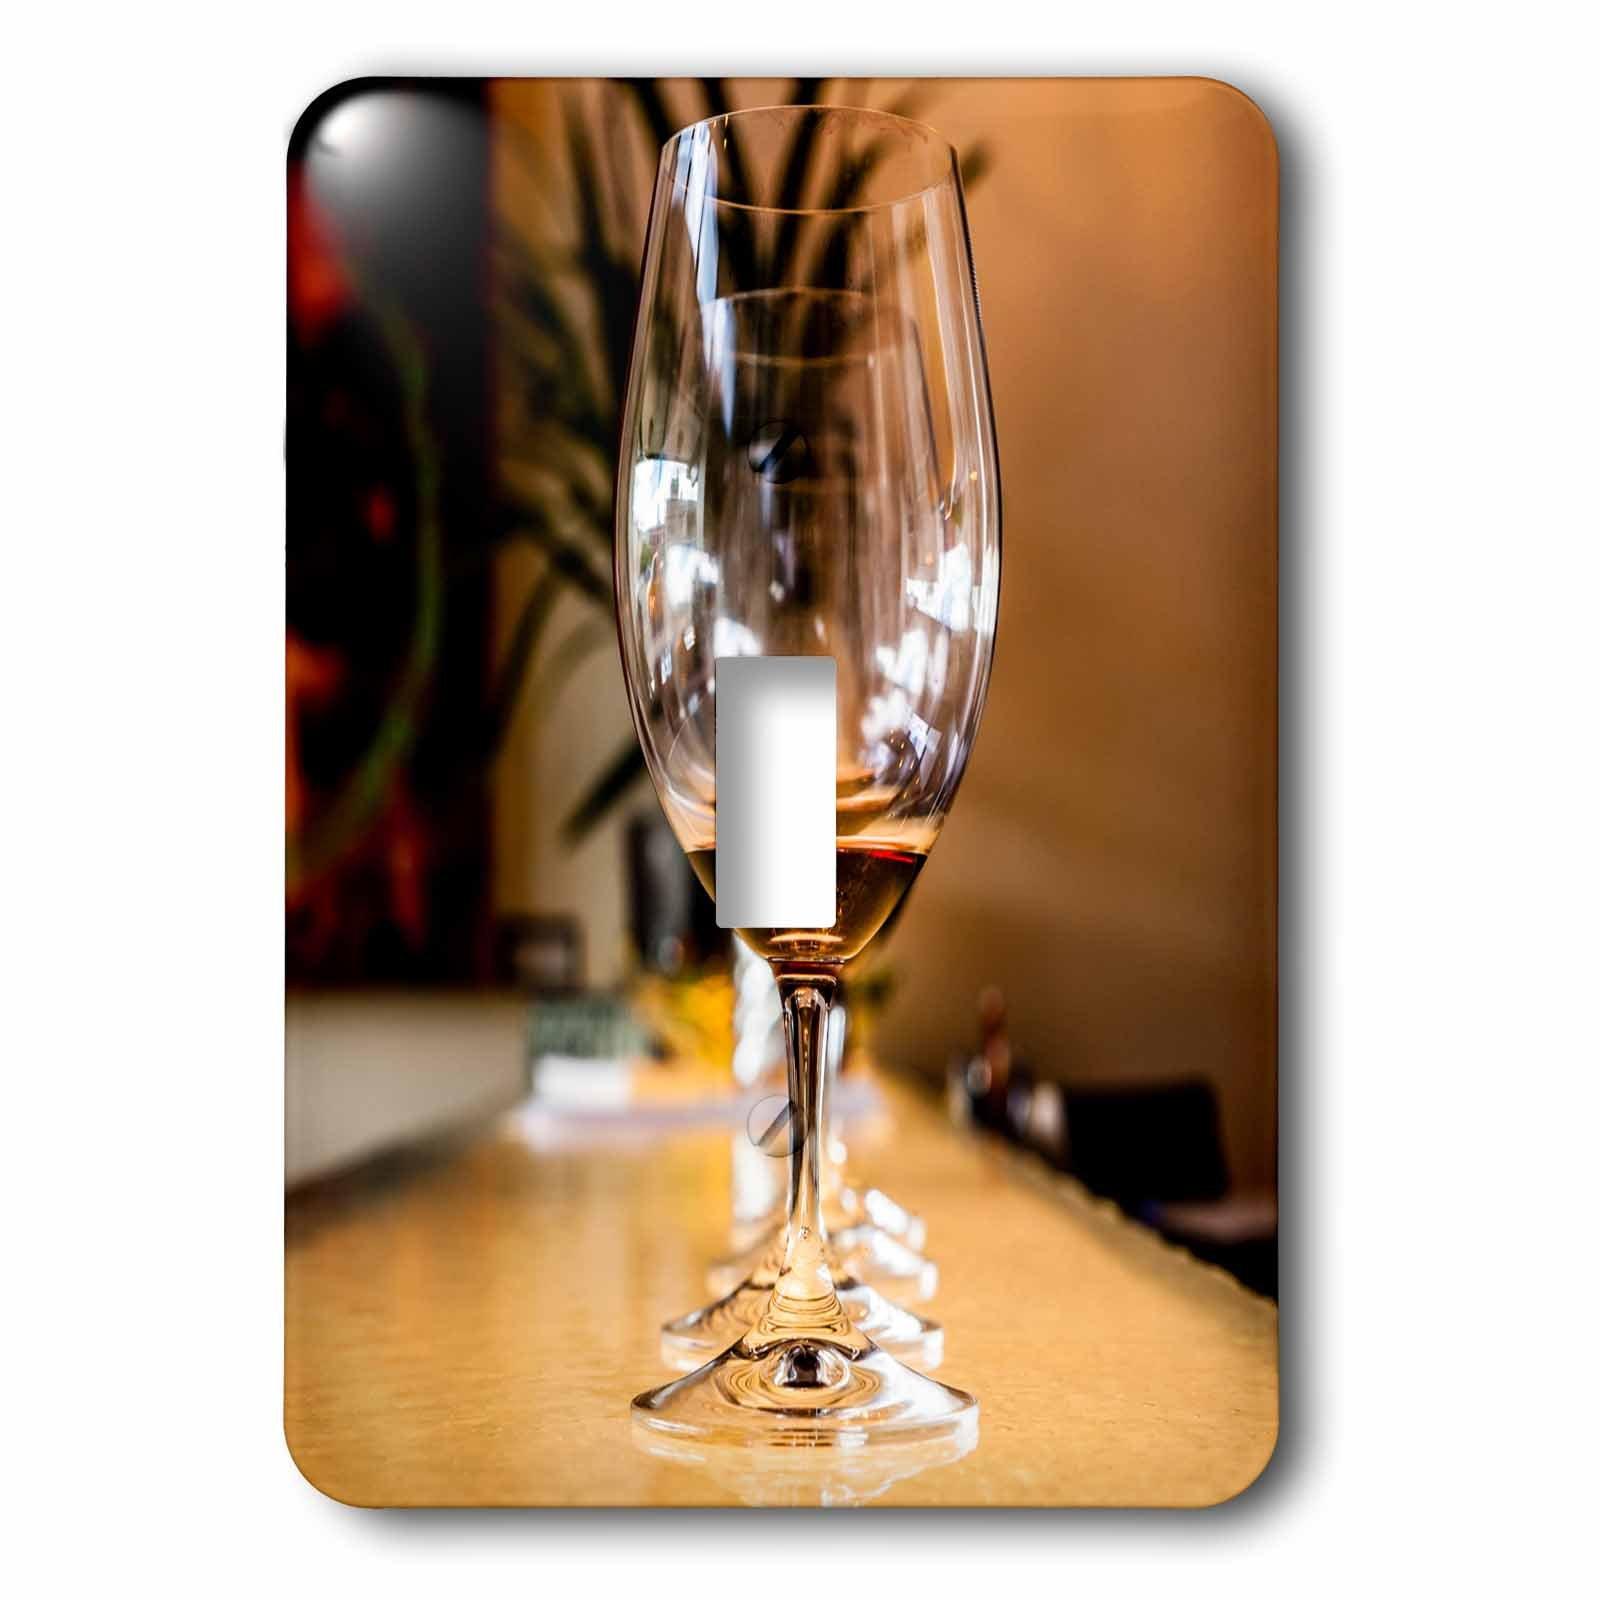 3dRose LSP_260513_1 USA, Washington, Wine Glasses Aligned on Counter Toggle Switch,